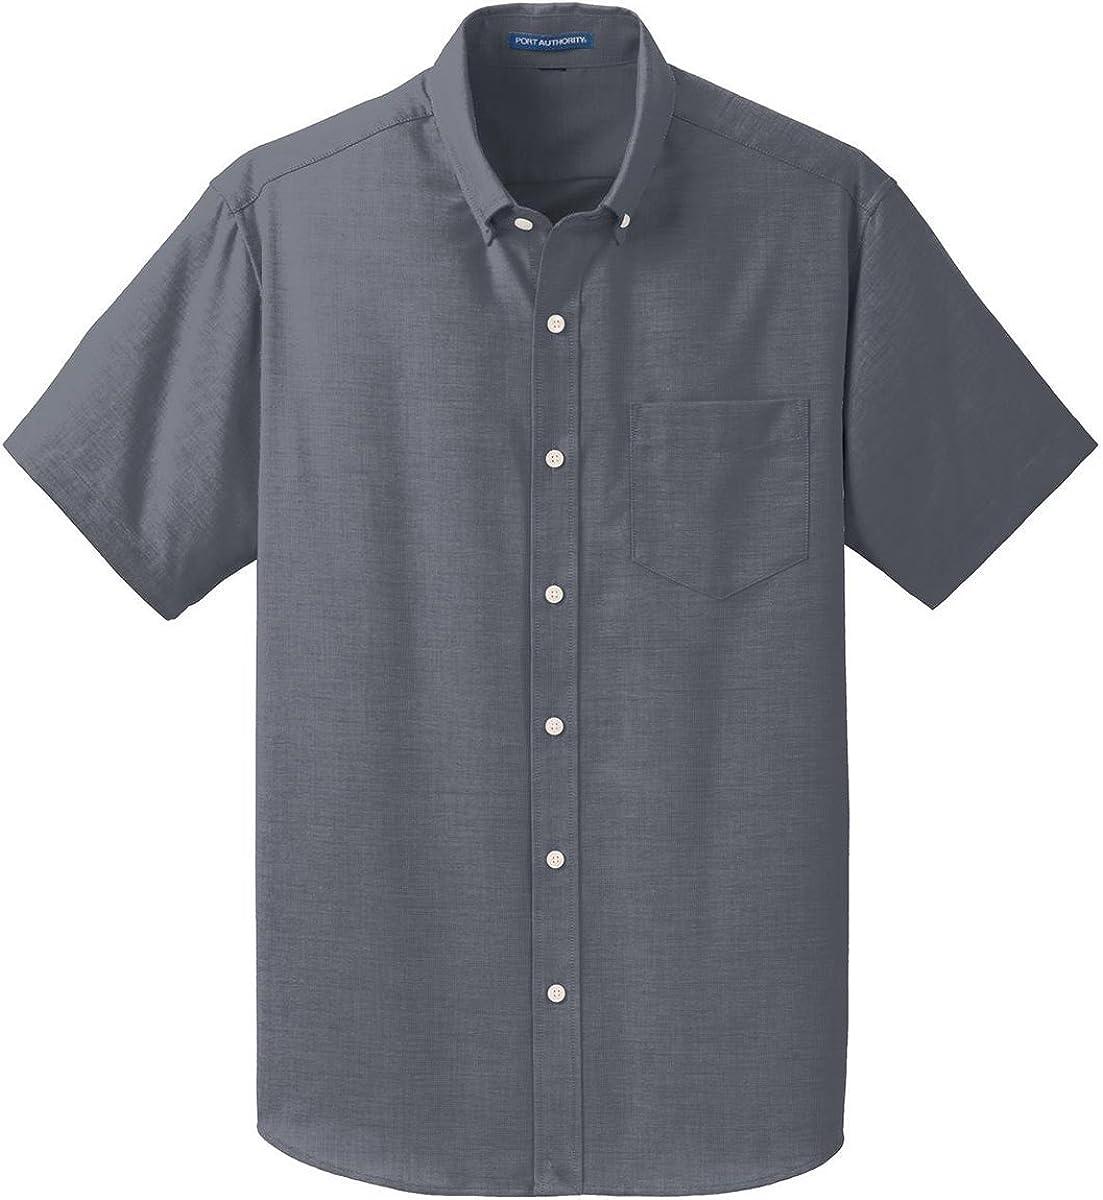 Port Authority S659 SuperPro Shirt